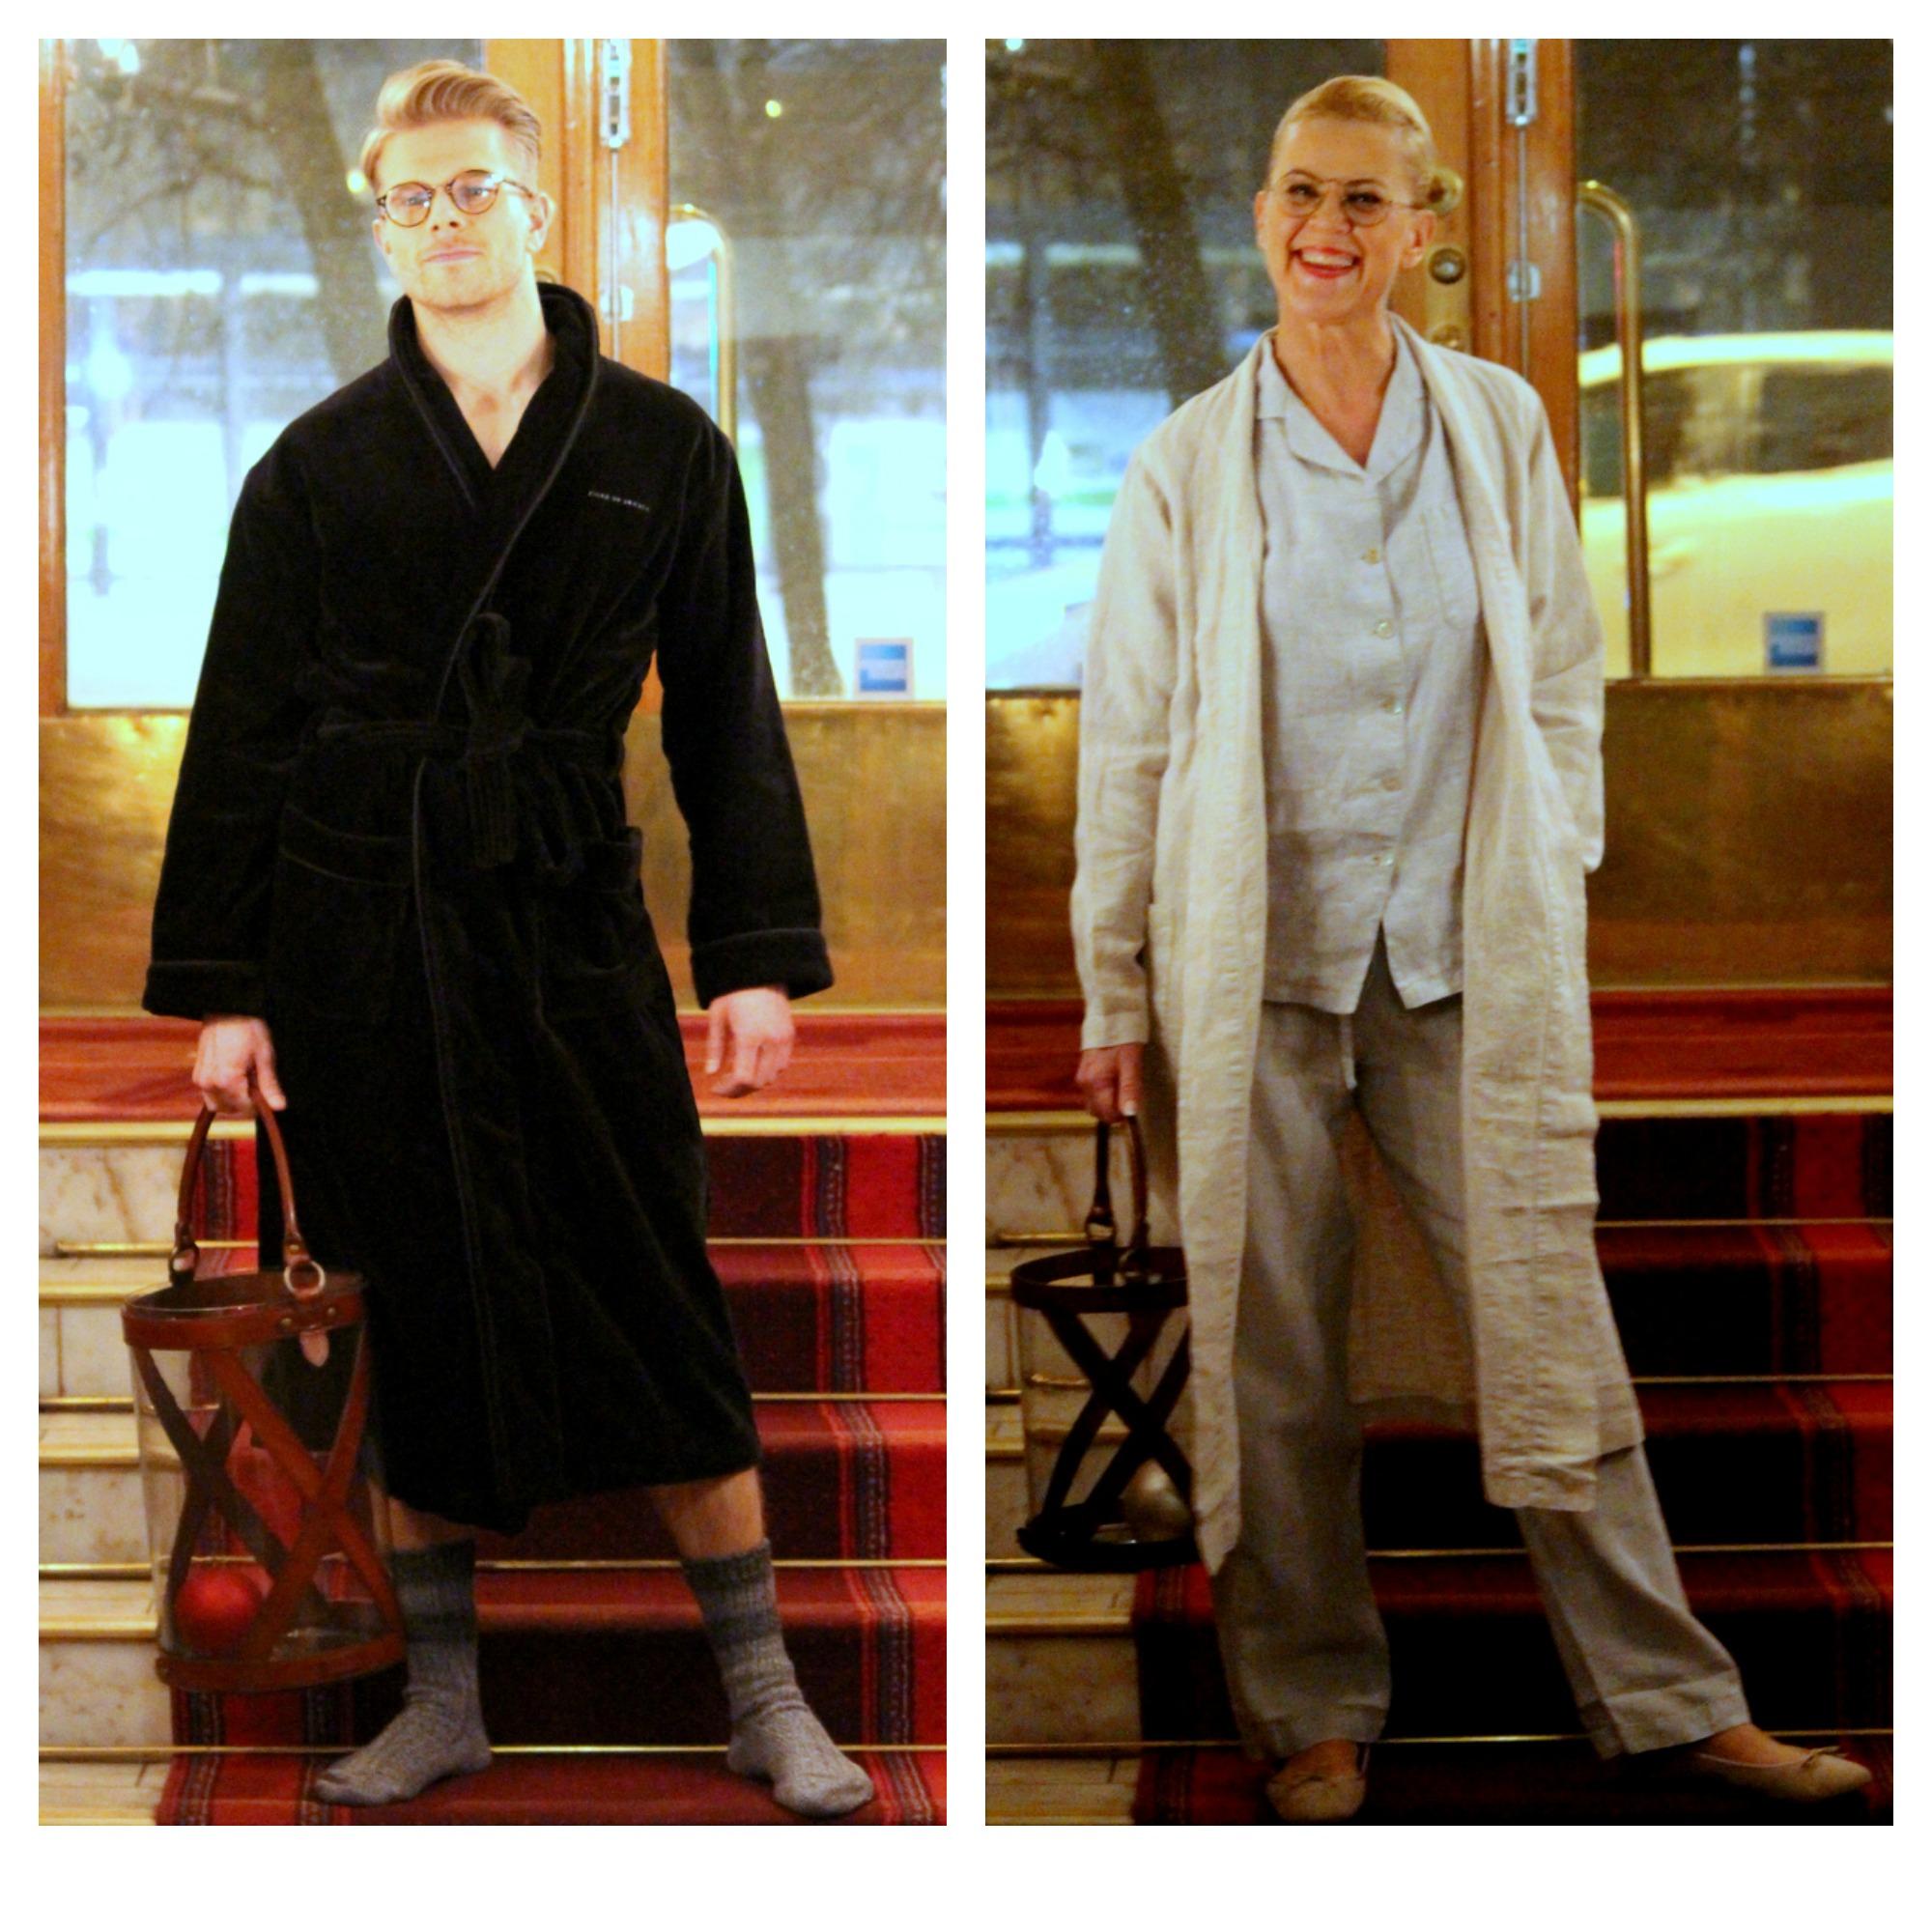 For Him Tiger of Sweden bathrobe and for Her Balmuir linen pyjamas & robe & lanterns, Flattered indoor ballerinas